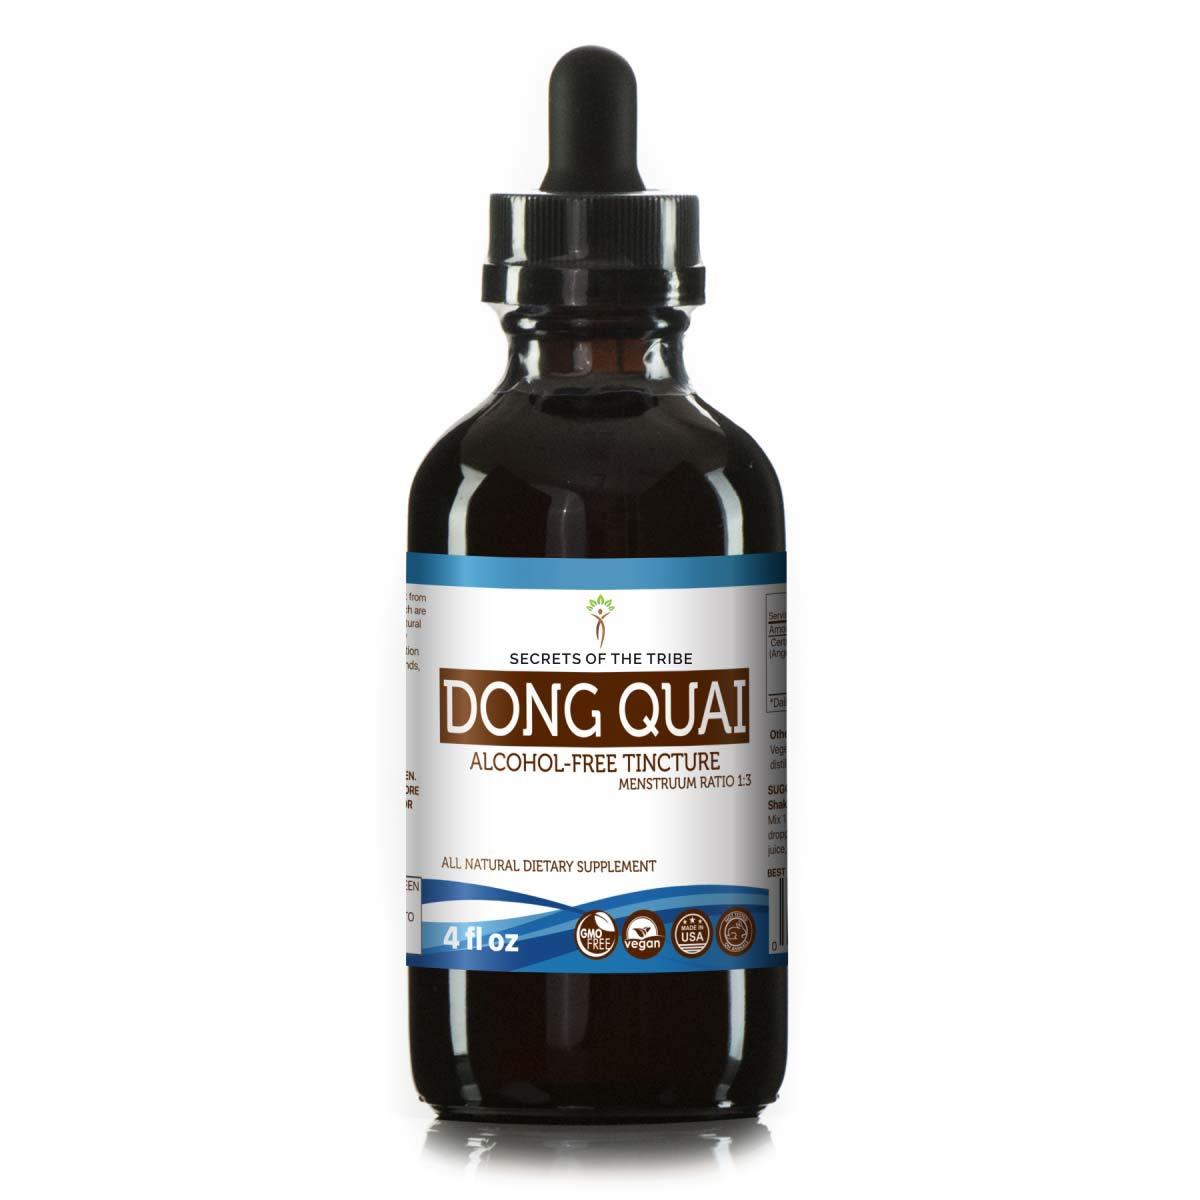 Dong Quai Alcohol-Free Liquid Extract, Organic Dong quai (Angelica sinensis) Dried Root Tincture Supplement (4 FL OZ)